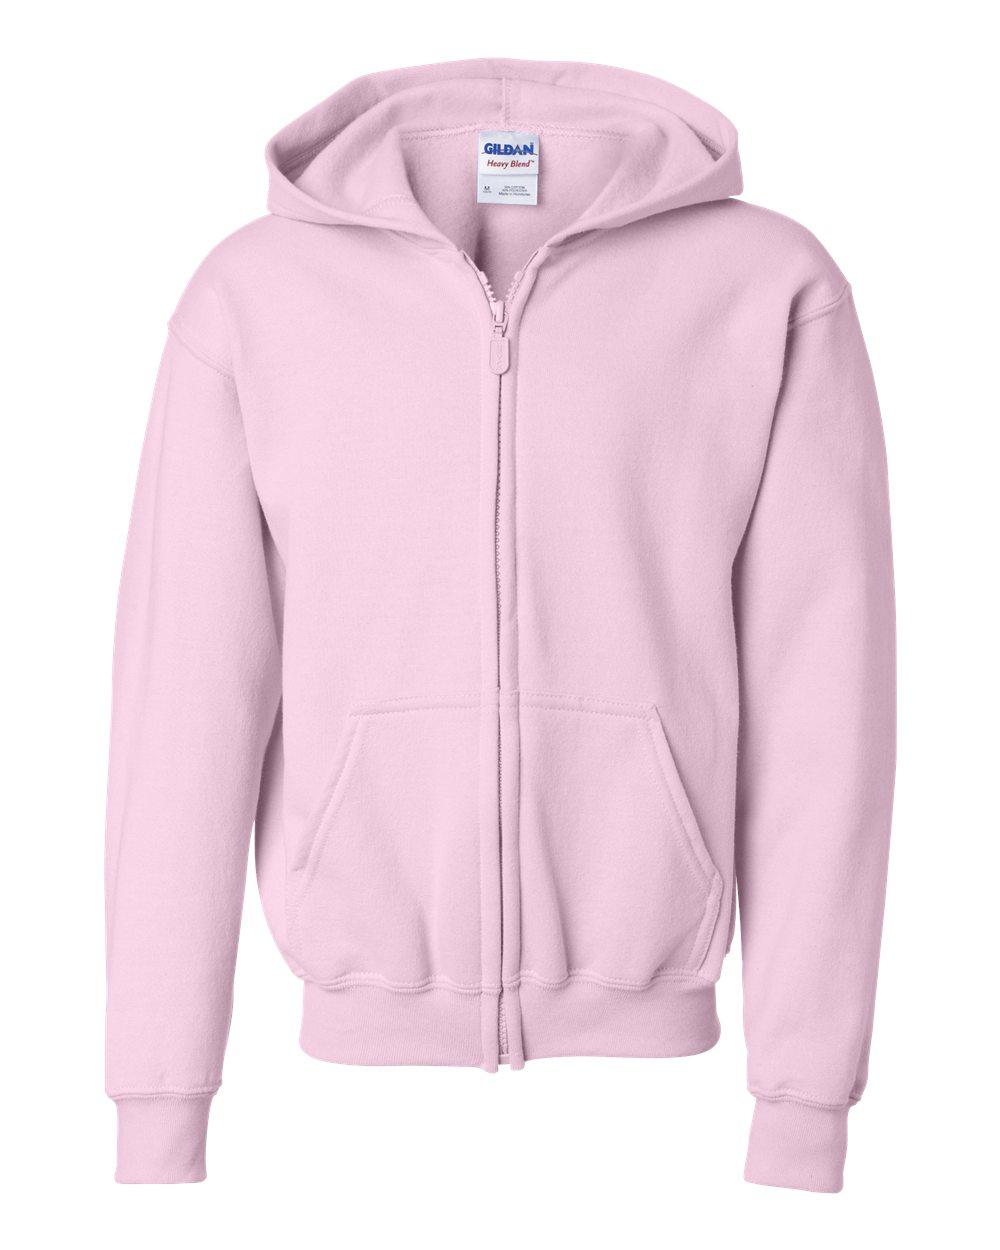 3d37a666 Gildan 18600B - Heavy Blend™ Youth Full-Zip Hooded Sweatshirt | Needen